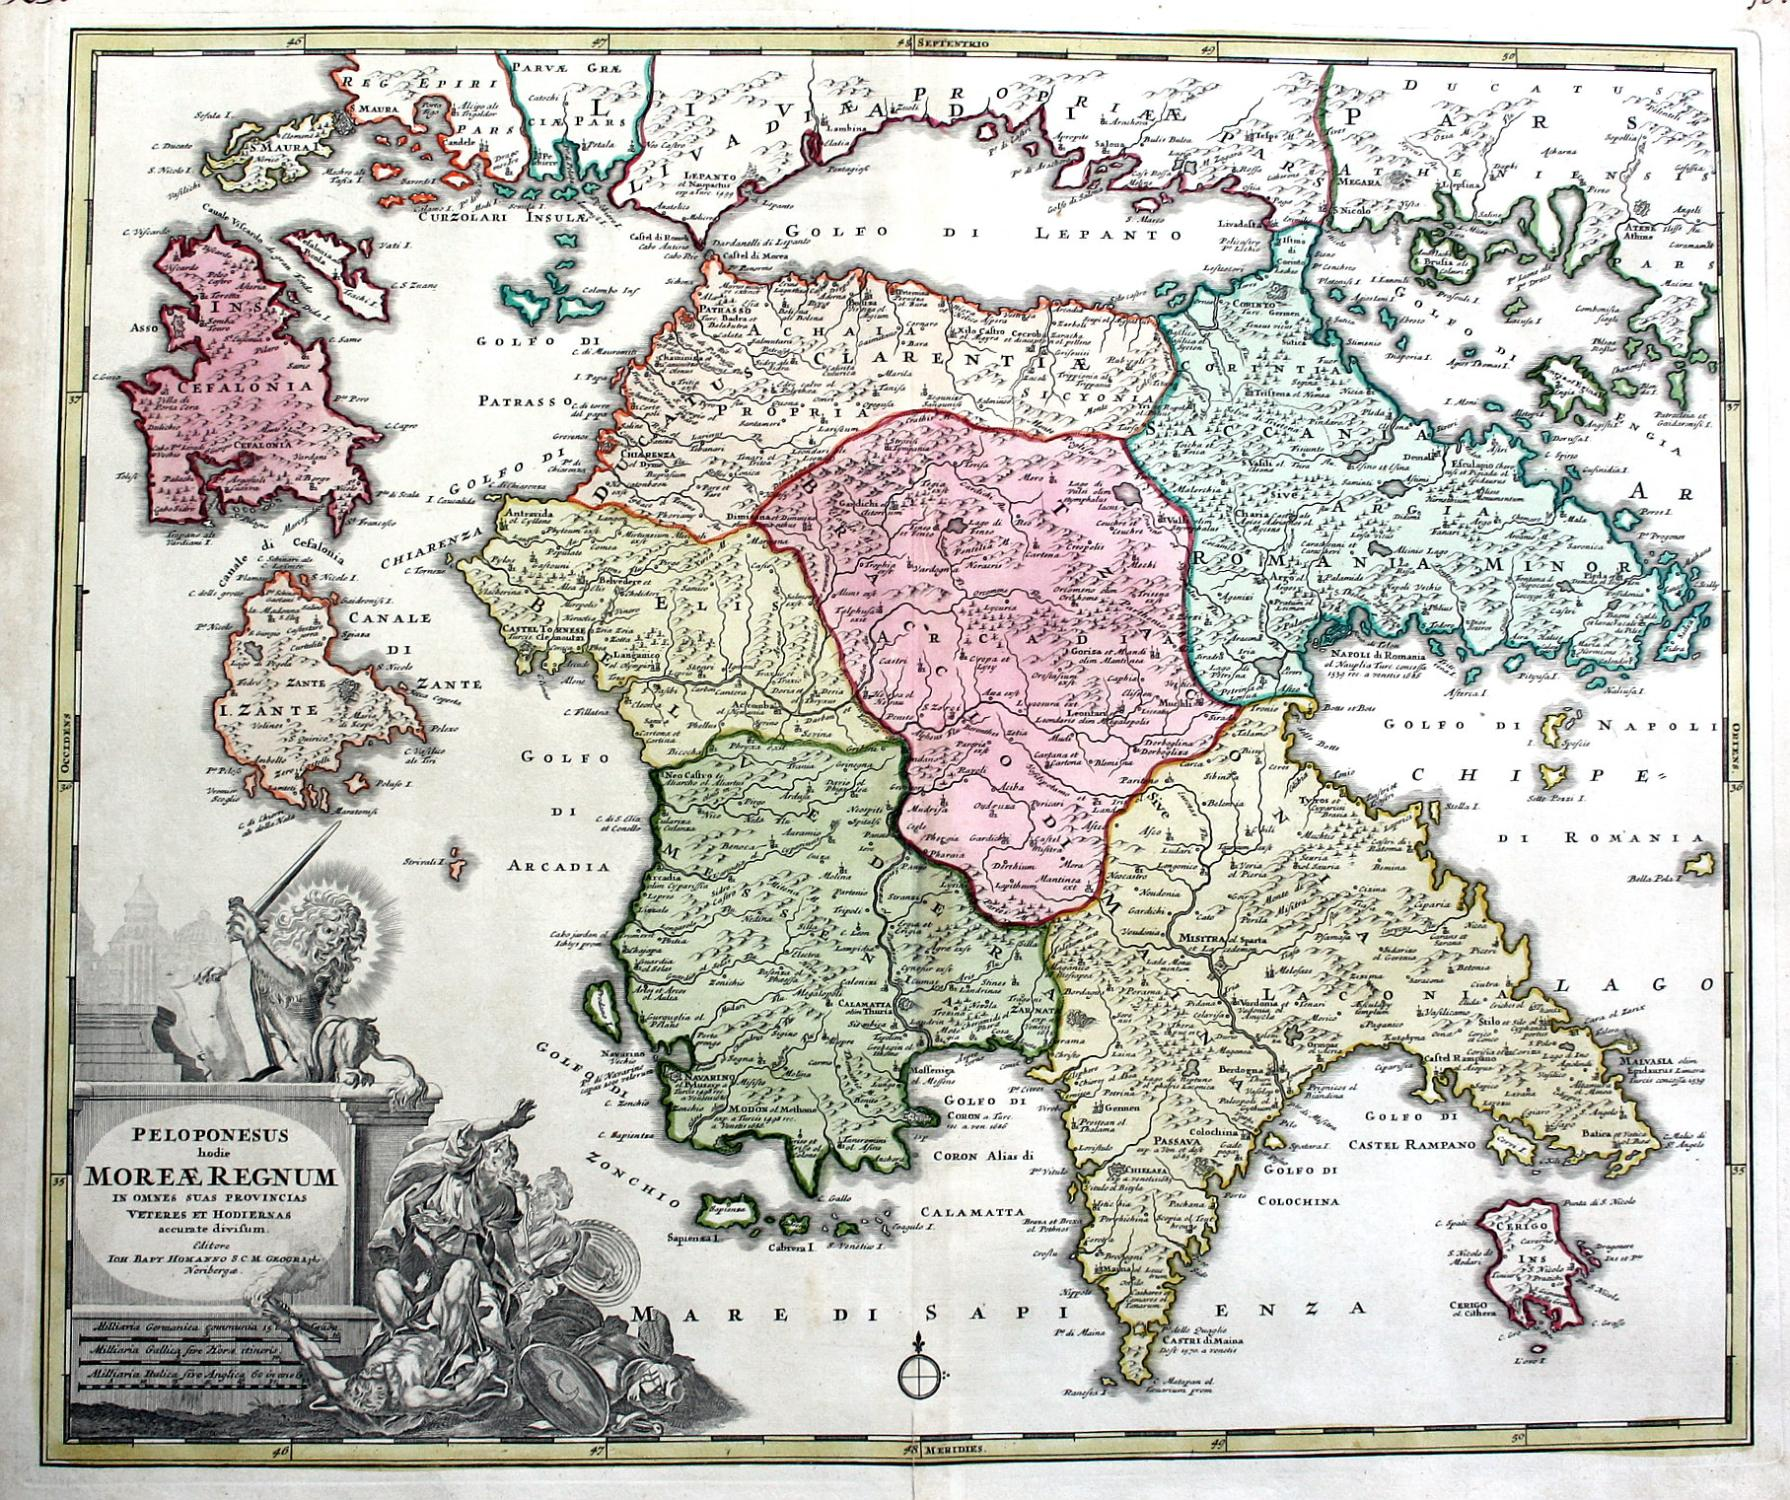 Griechenland Peloponnes Karte Deutsch.Peloponesus Hodie Moreae Regnum Peloponnes Peloponnese Kefalonia